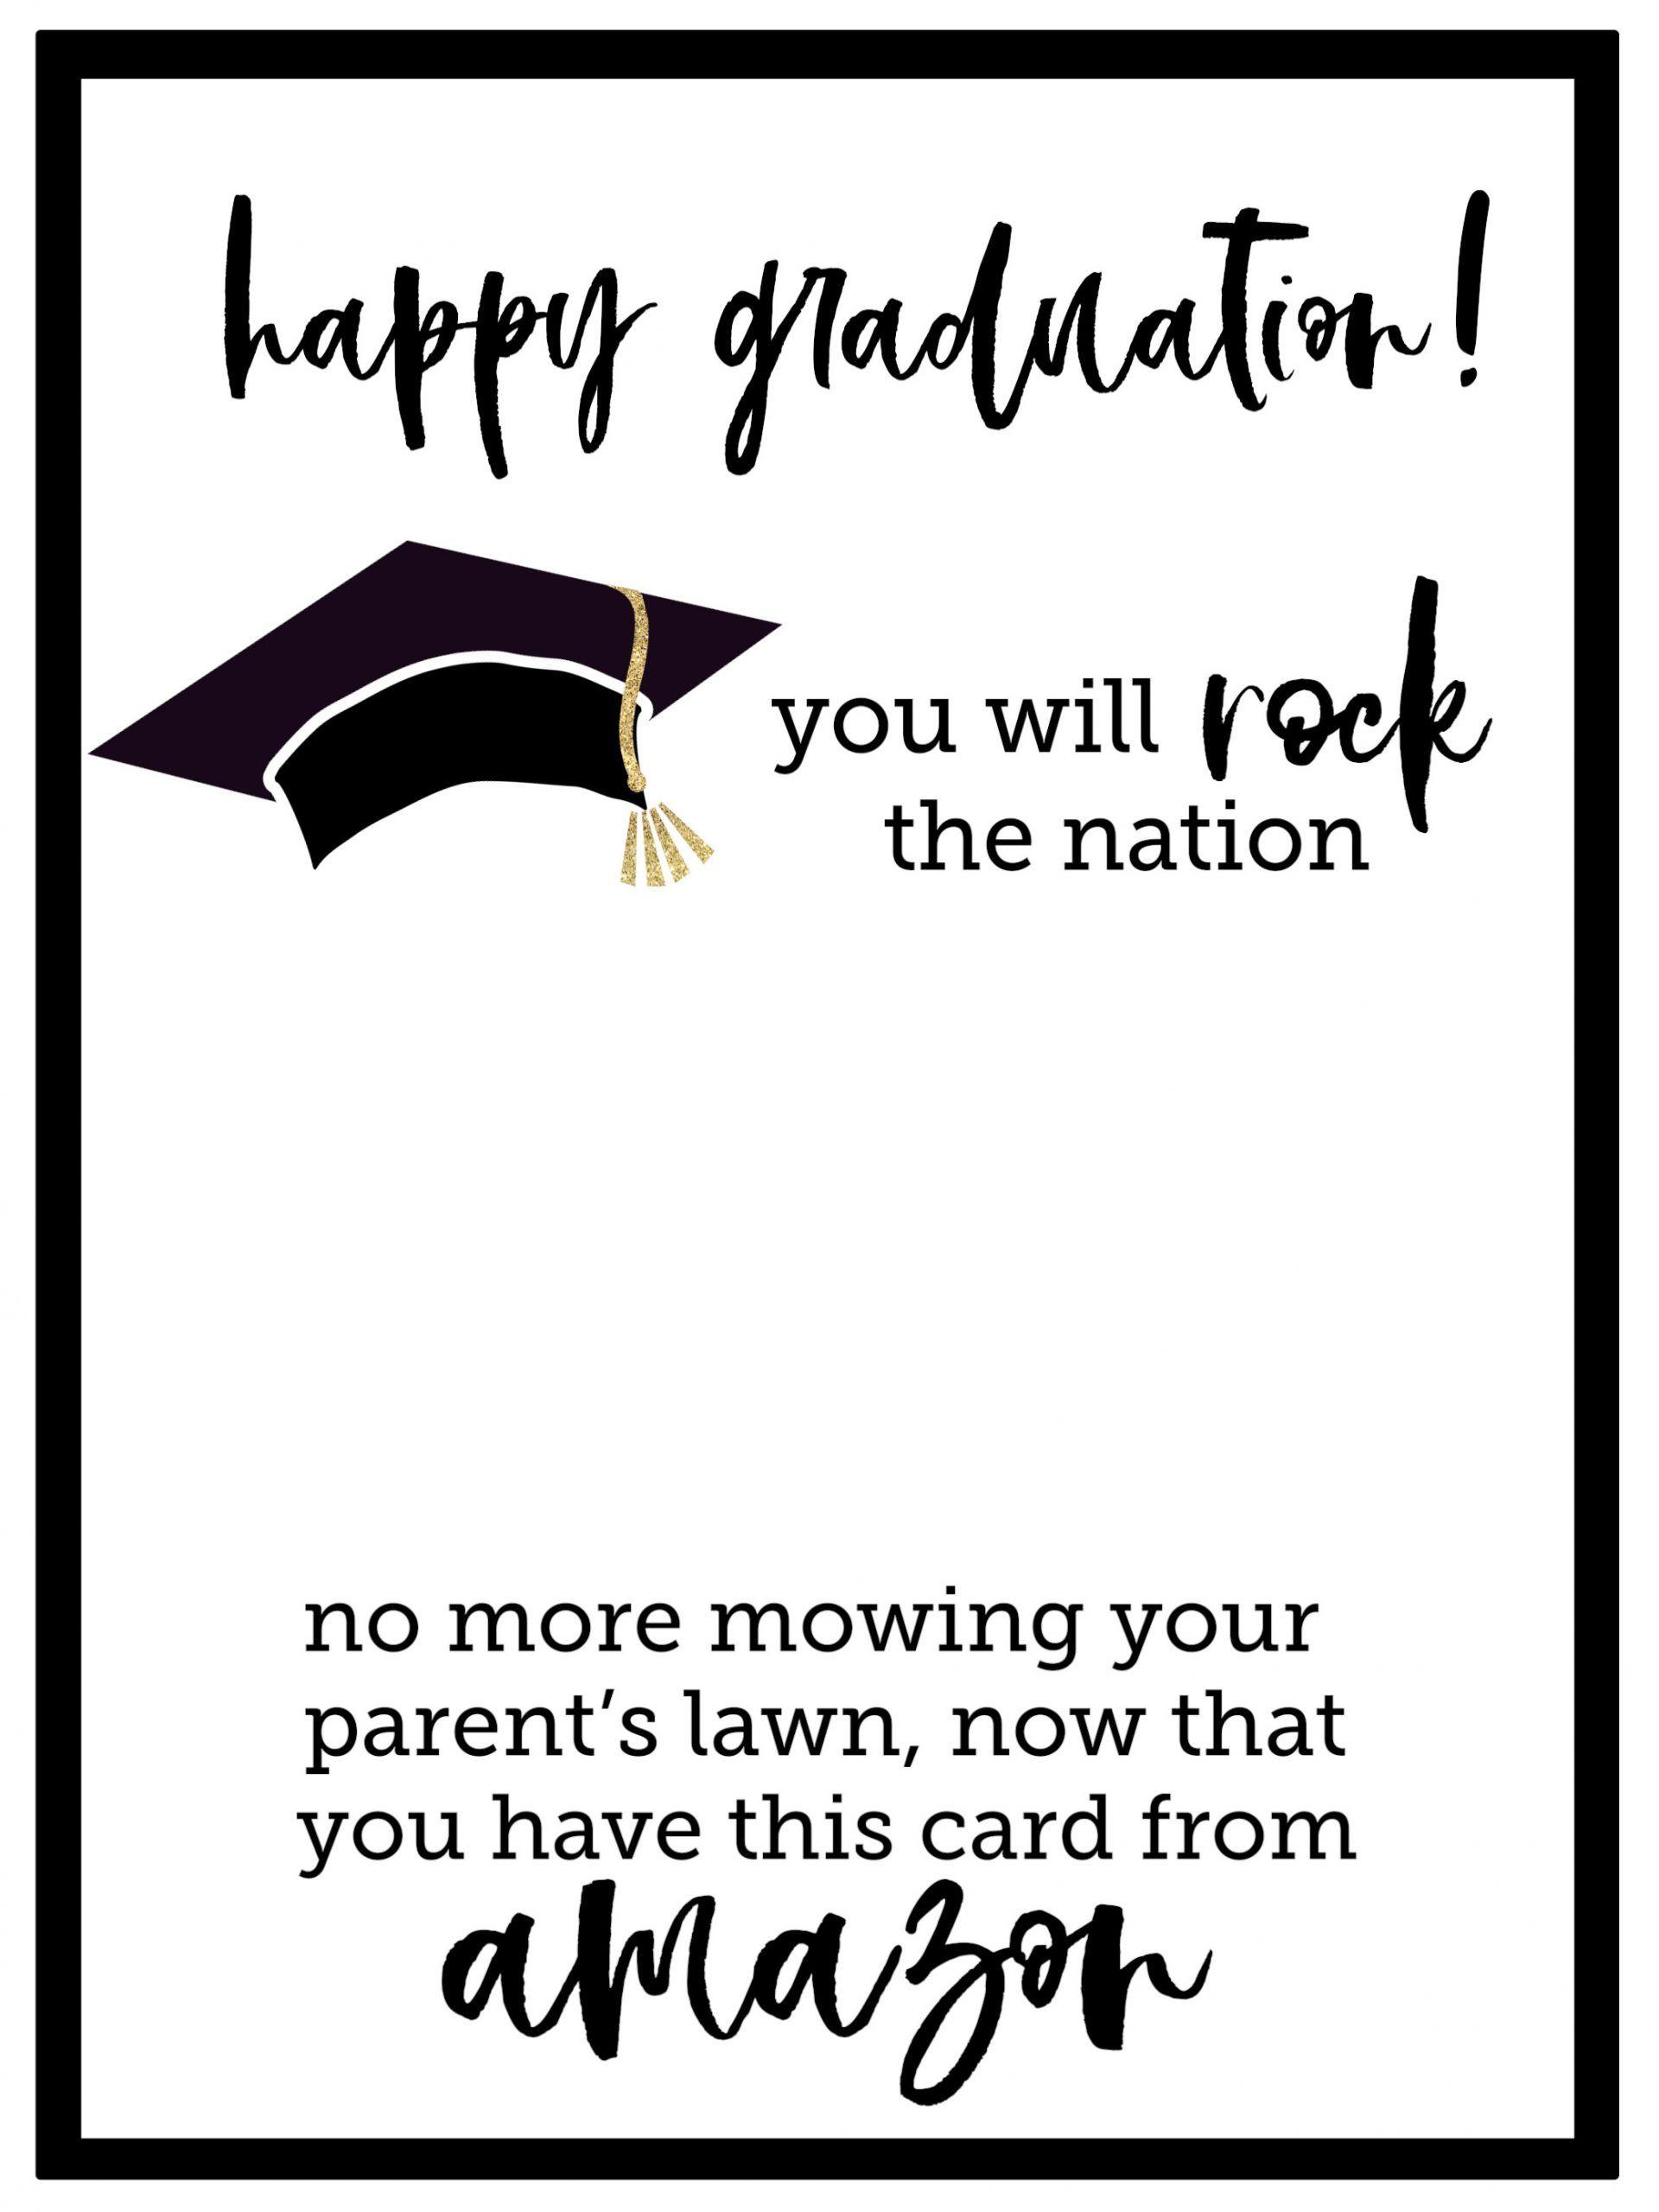 Graduation Card Template Word Graduation Card Templates Graduation Cards Graduation Invitation Cards